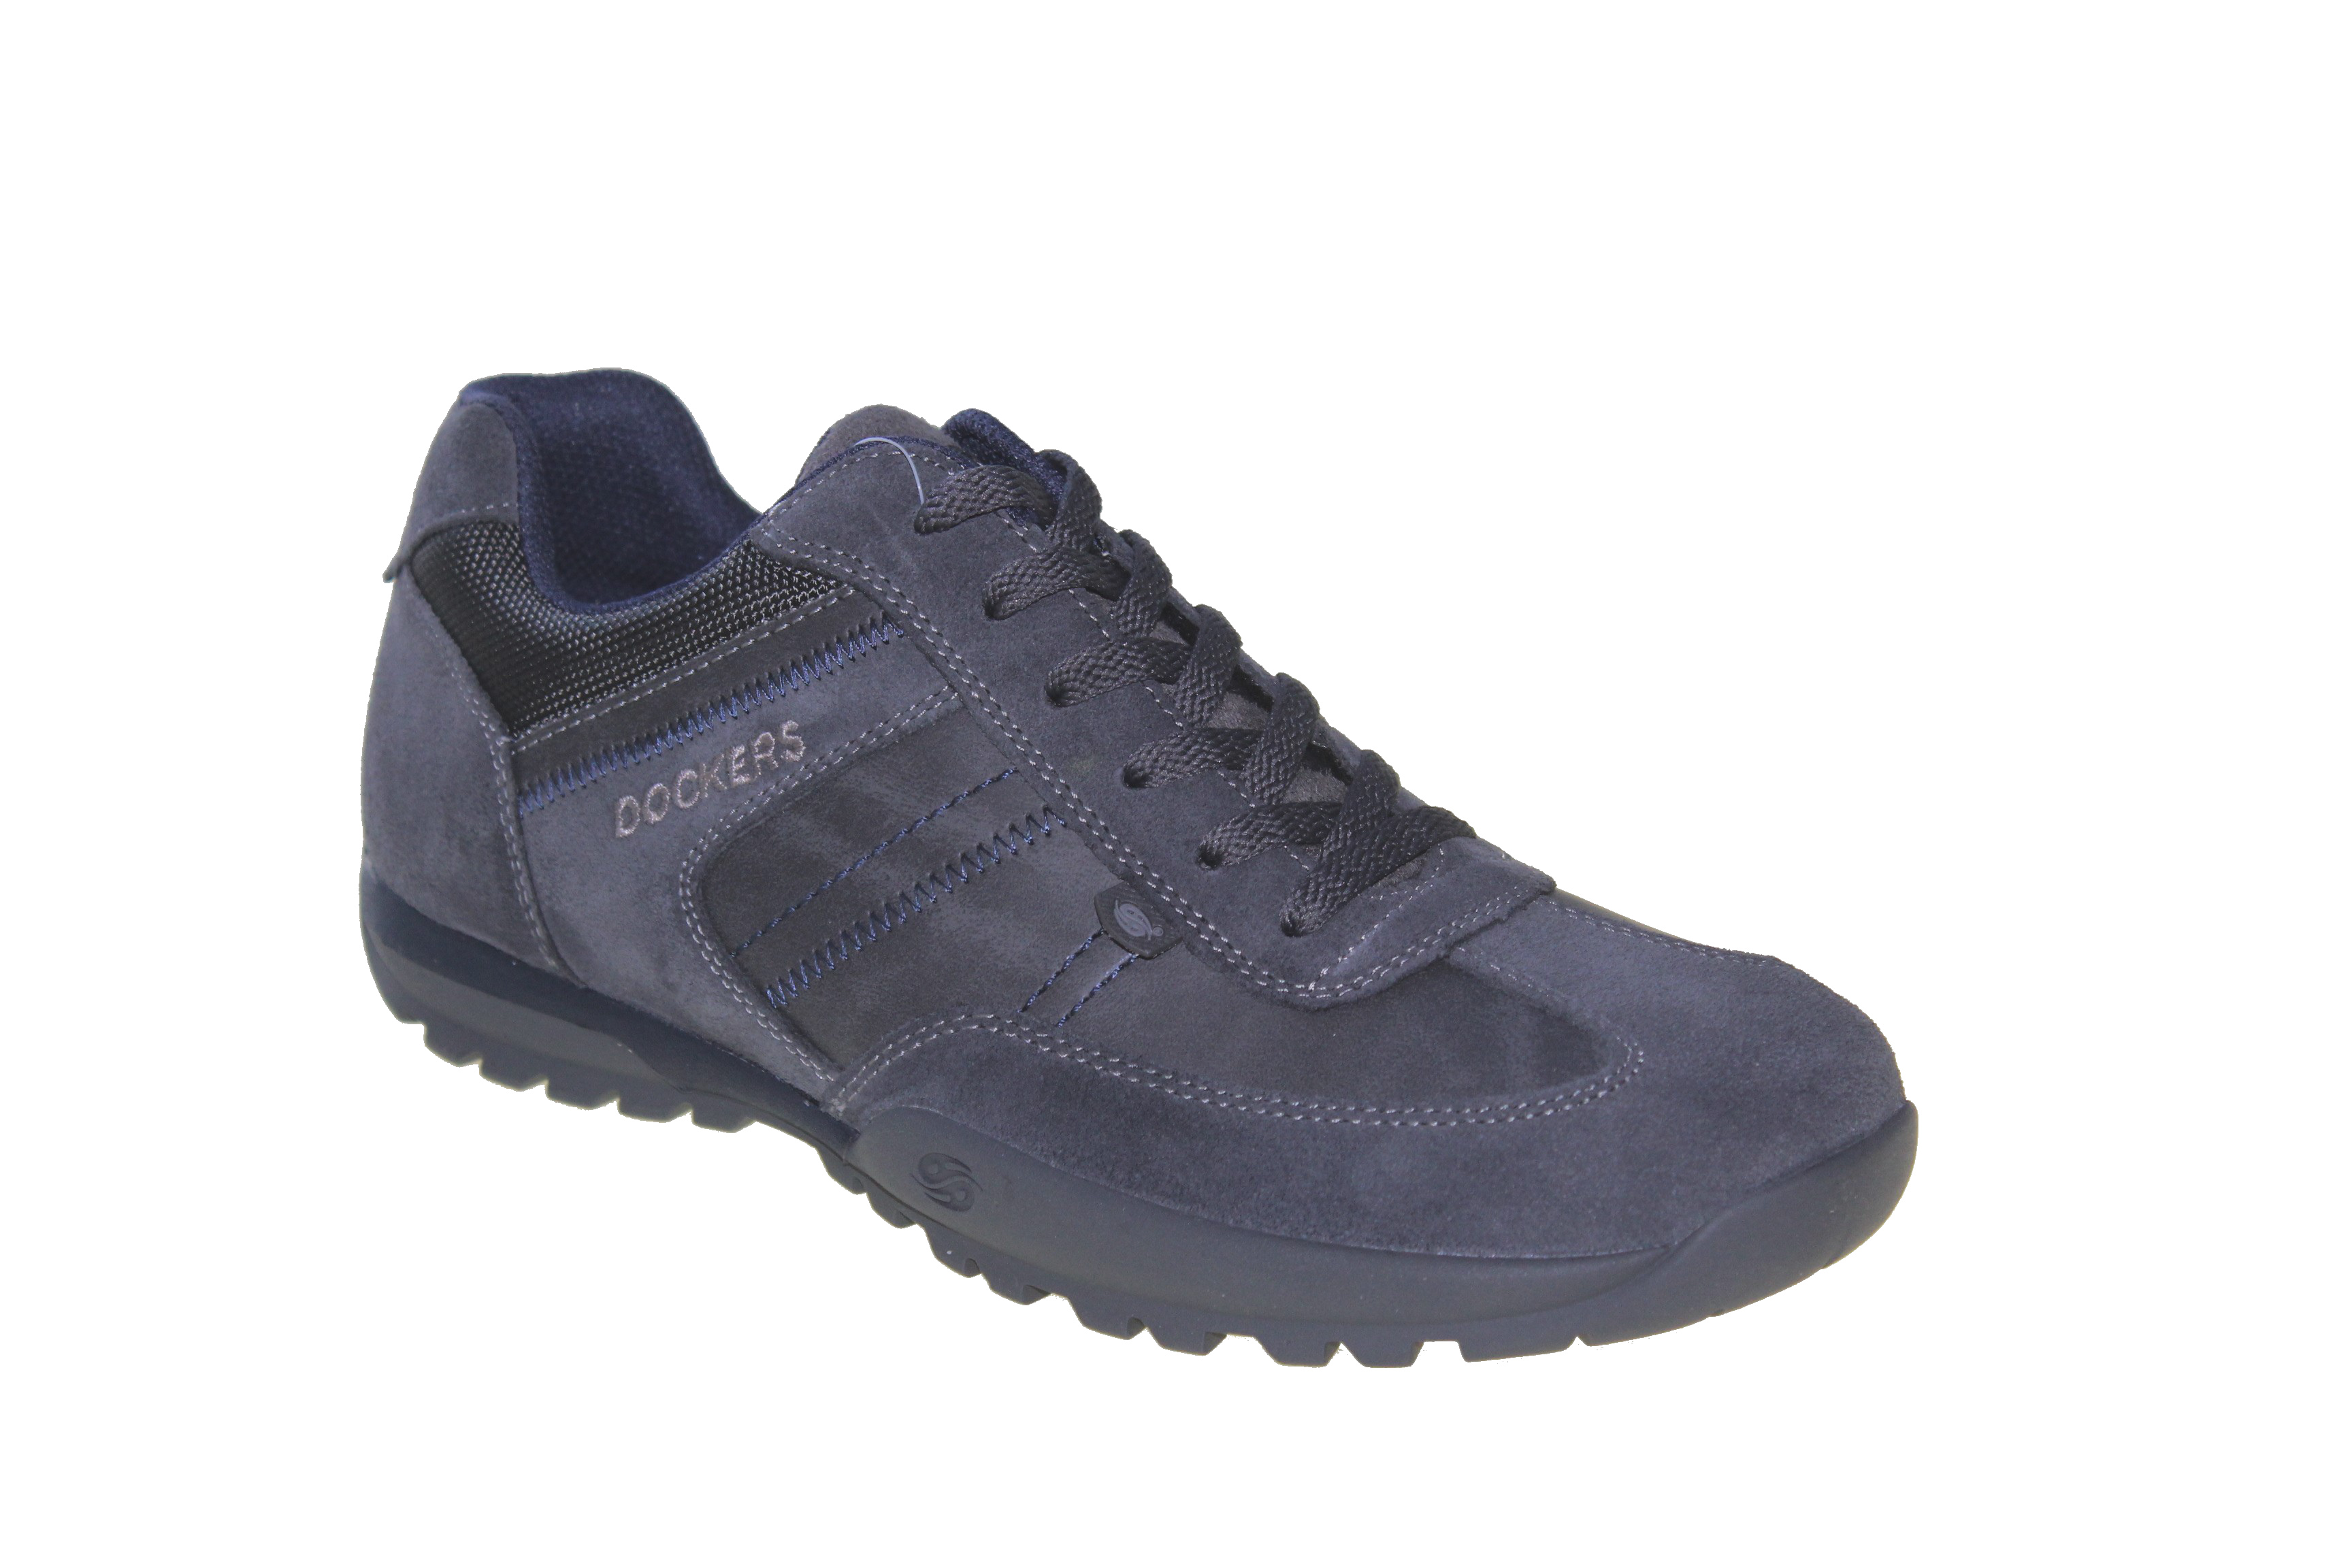 Details zu NEU Dockers 36HT004 206236 Herrenschuhe Sneaker Halbschuhe Leder Grau do23